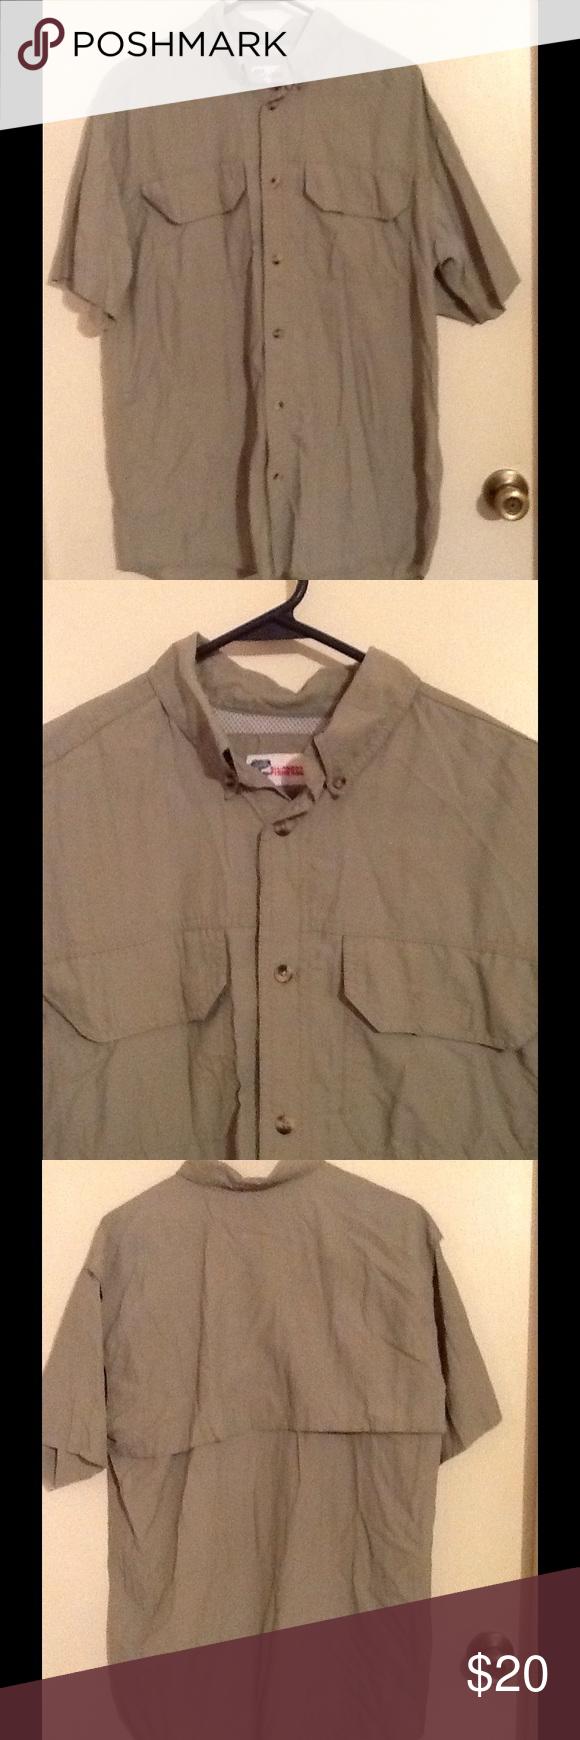 Men's Fishing Shirt (M) This fishing shirt has a mesh lining in the top back area of the shirt. ALL-AMERICAN FISHERMAN Shirts Casual Button Down Shirts